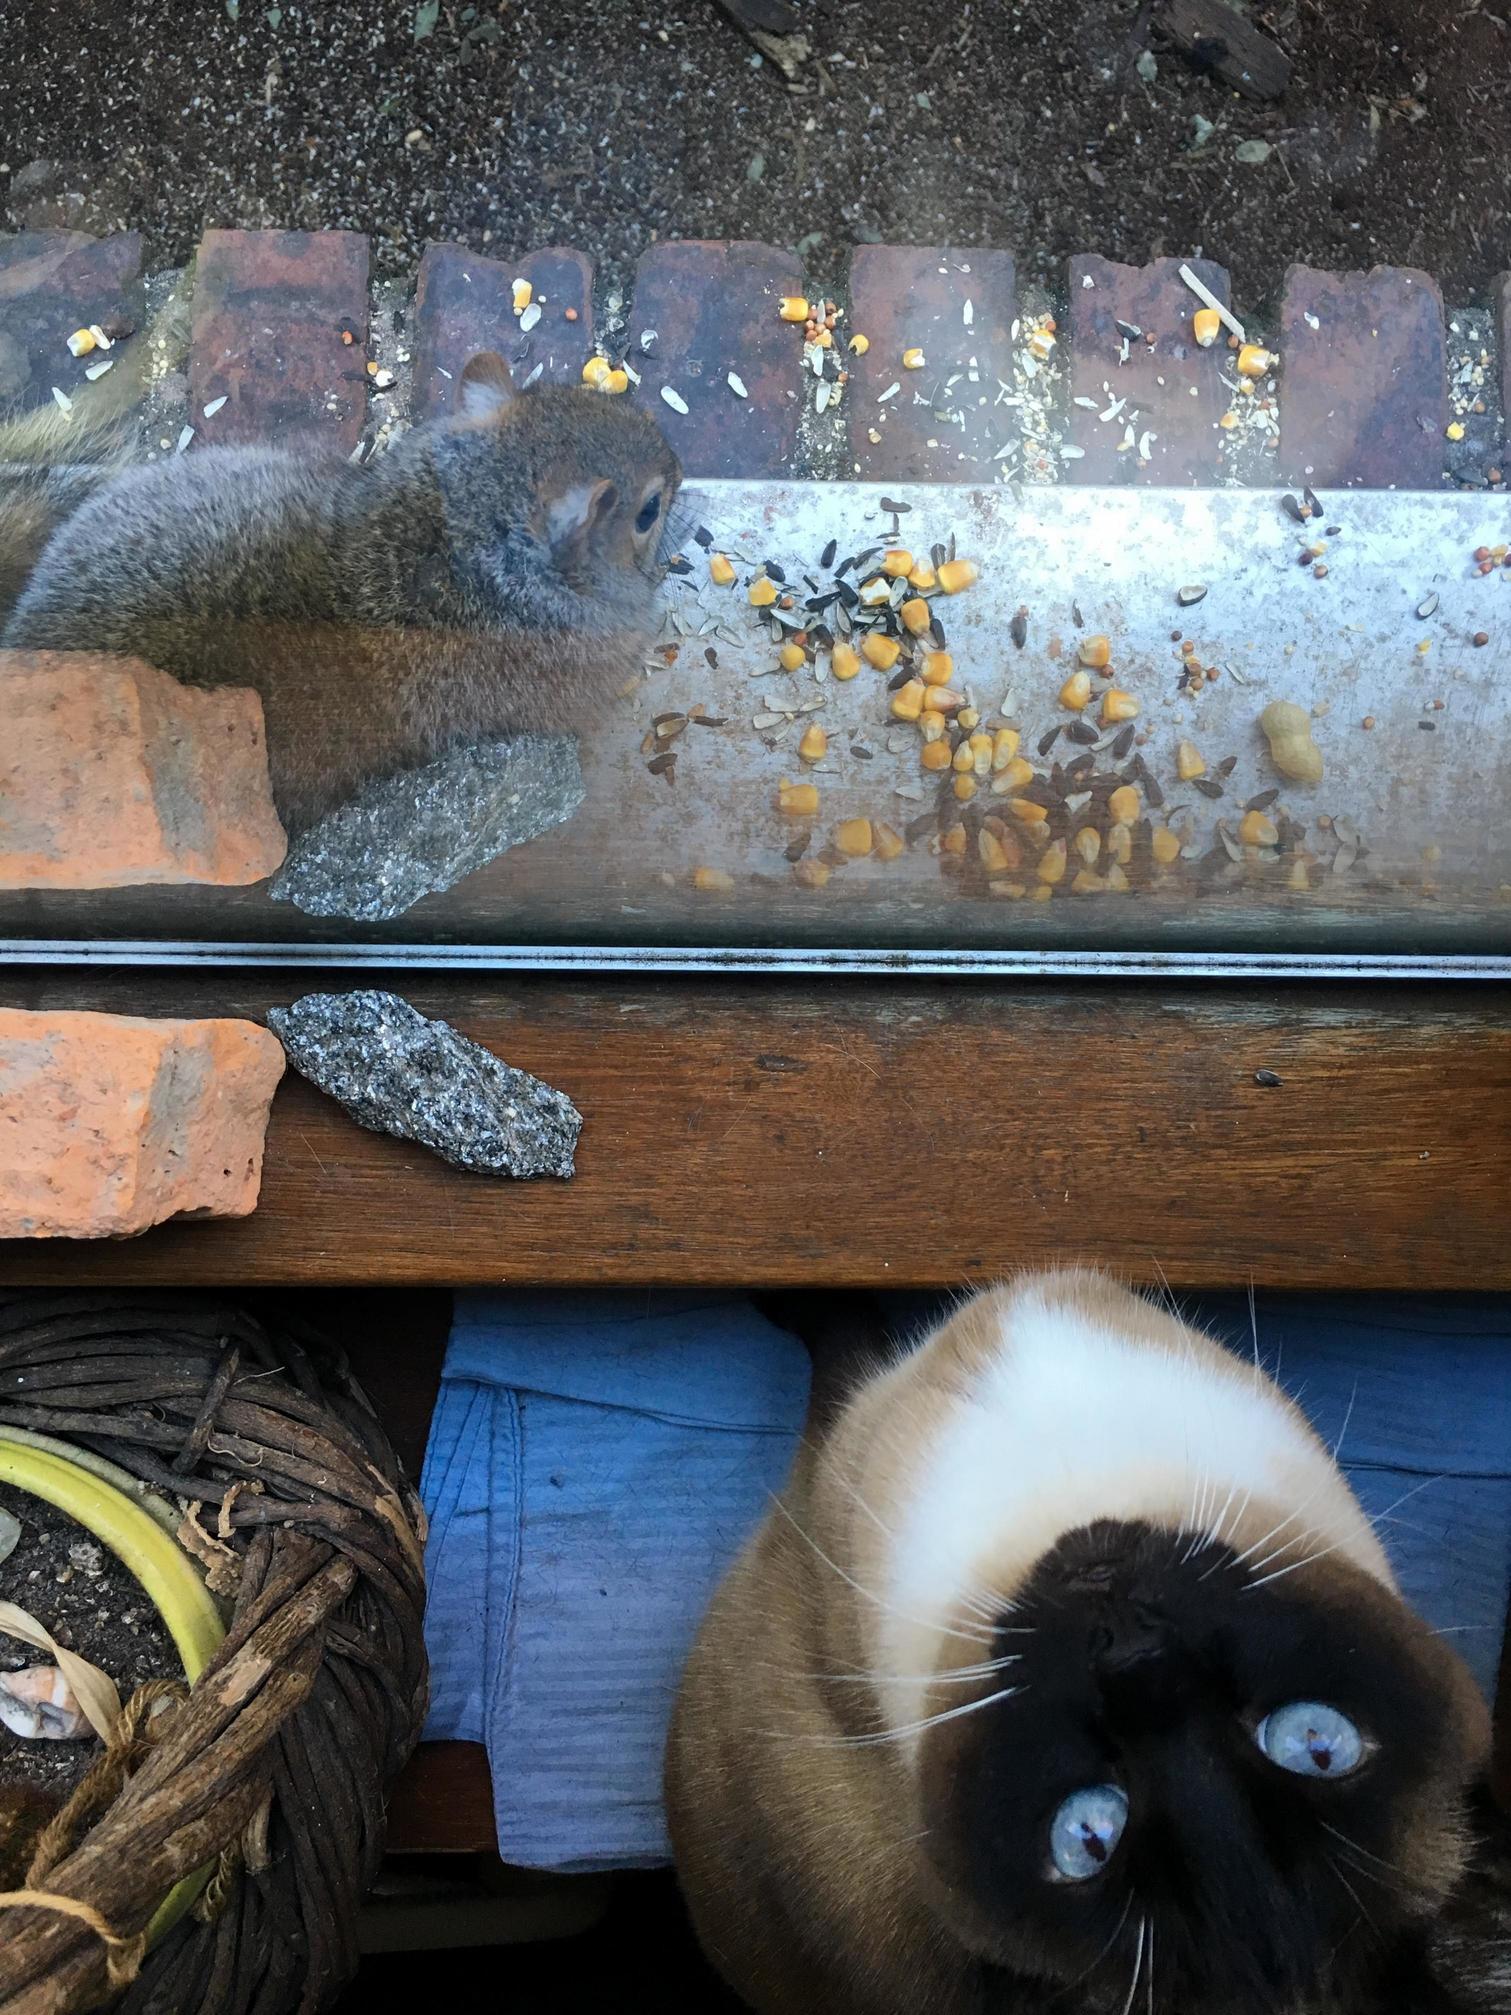 Jasmine would you pleeeeeeease let me play with mr. squirrel